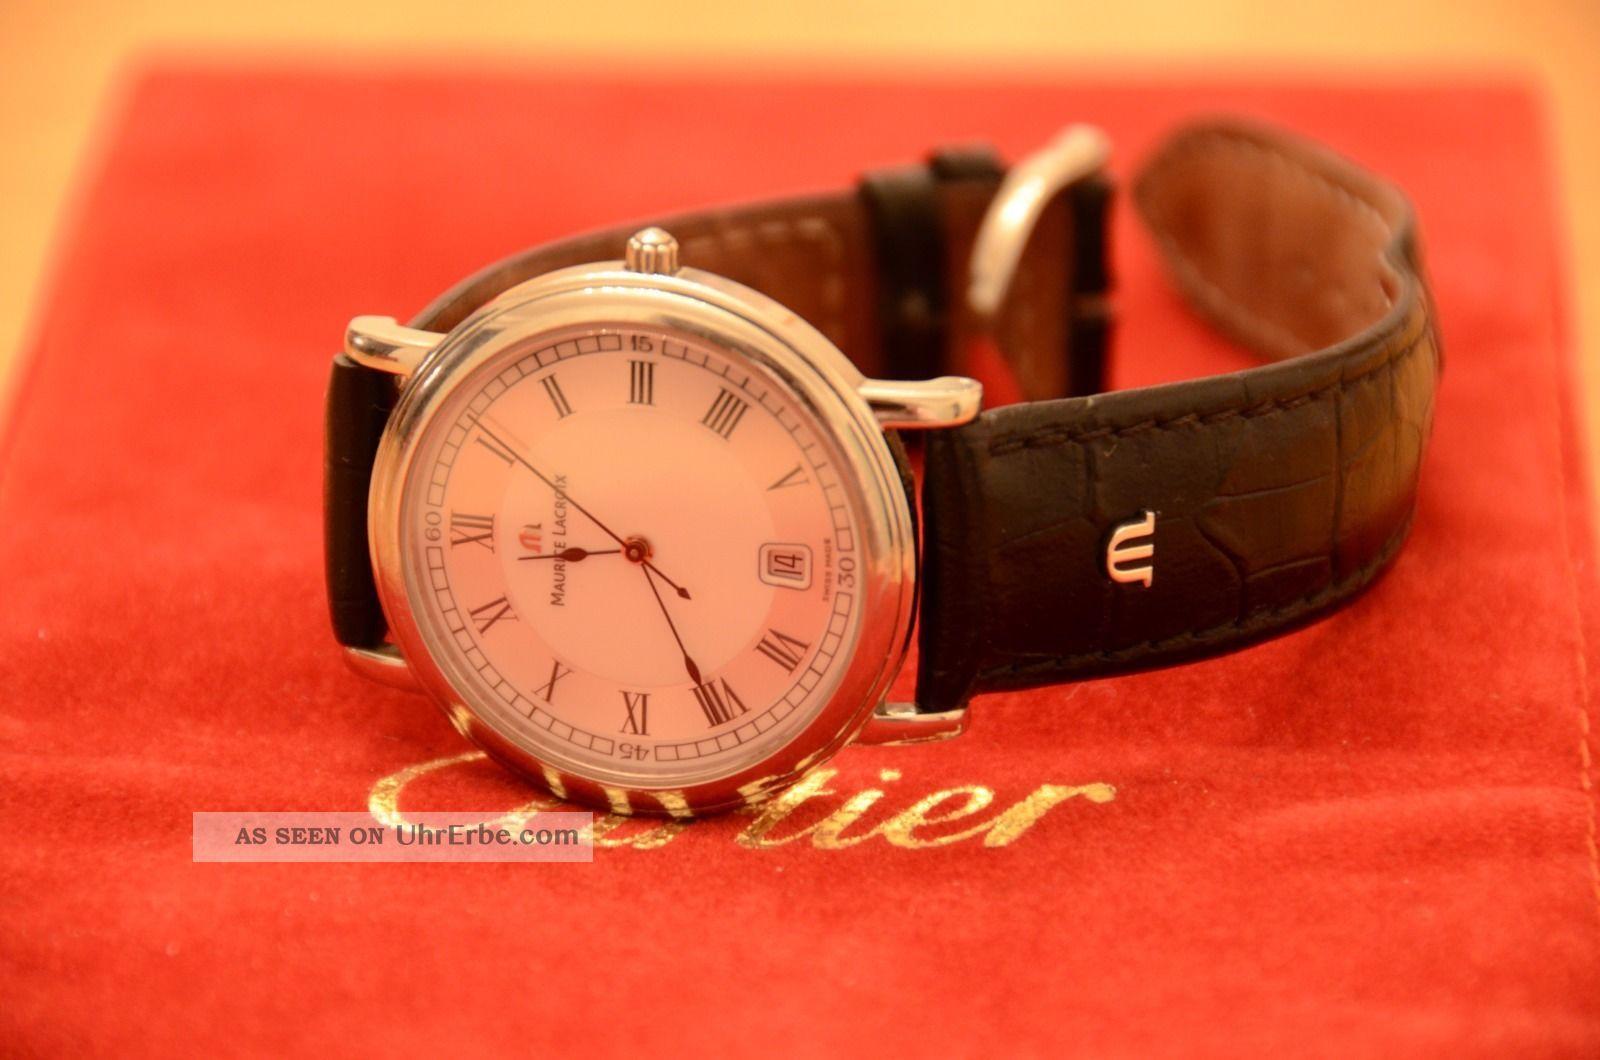 Maurice Lacroix Armbanduhr - Classic - Herrenuhr Armbanduhren Bild